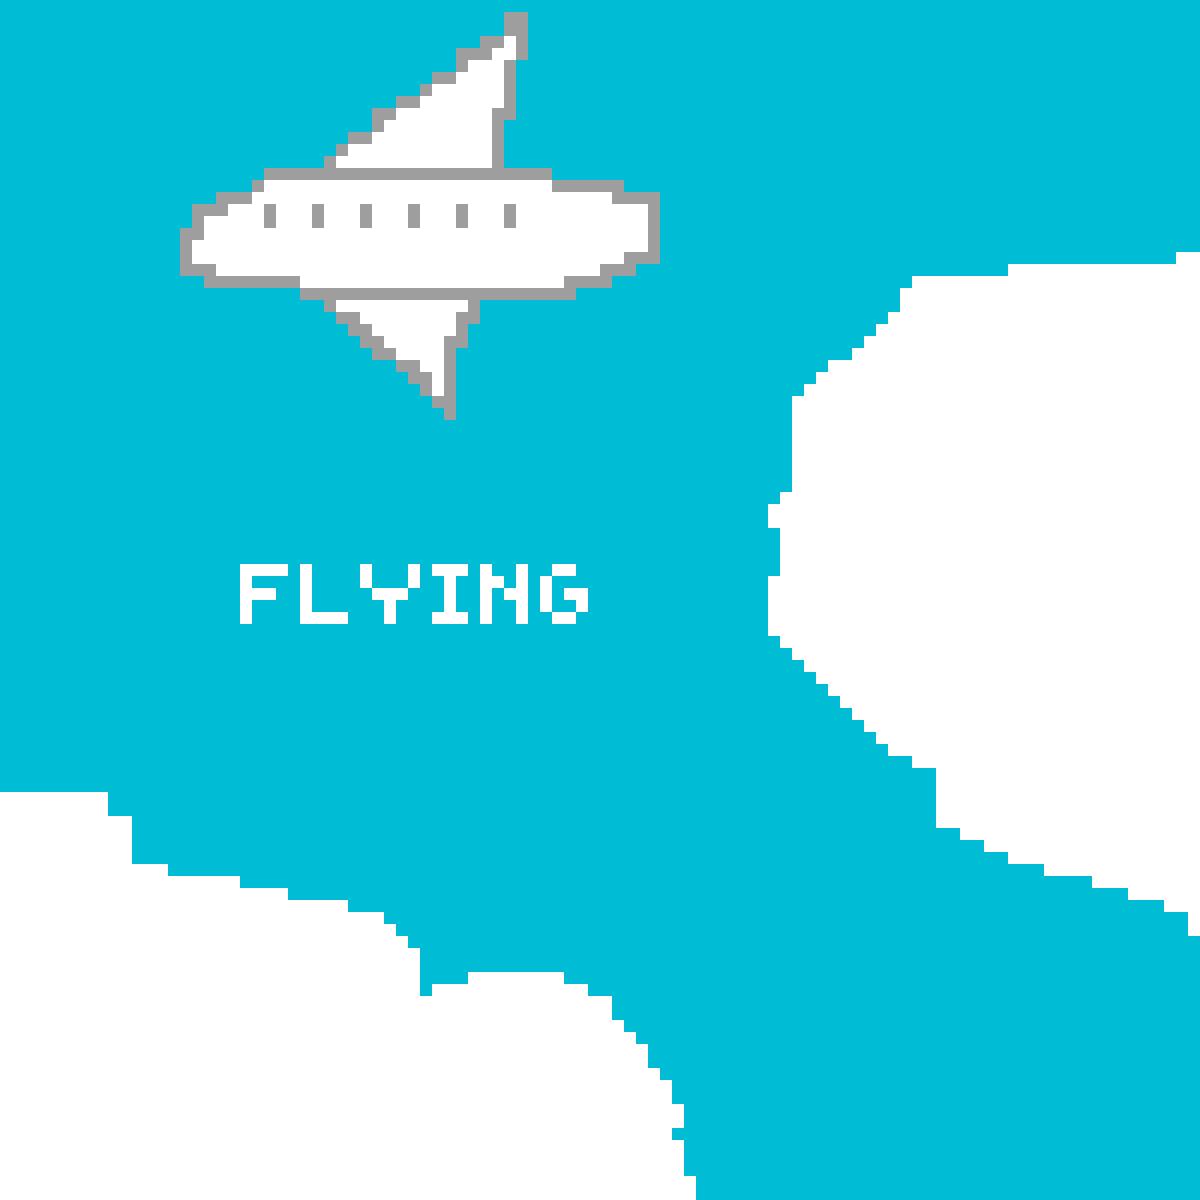 Flying? by Maximum-Ride